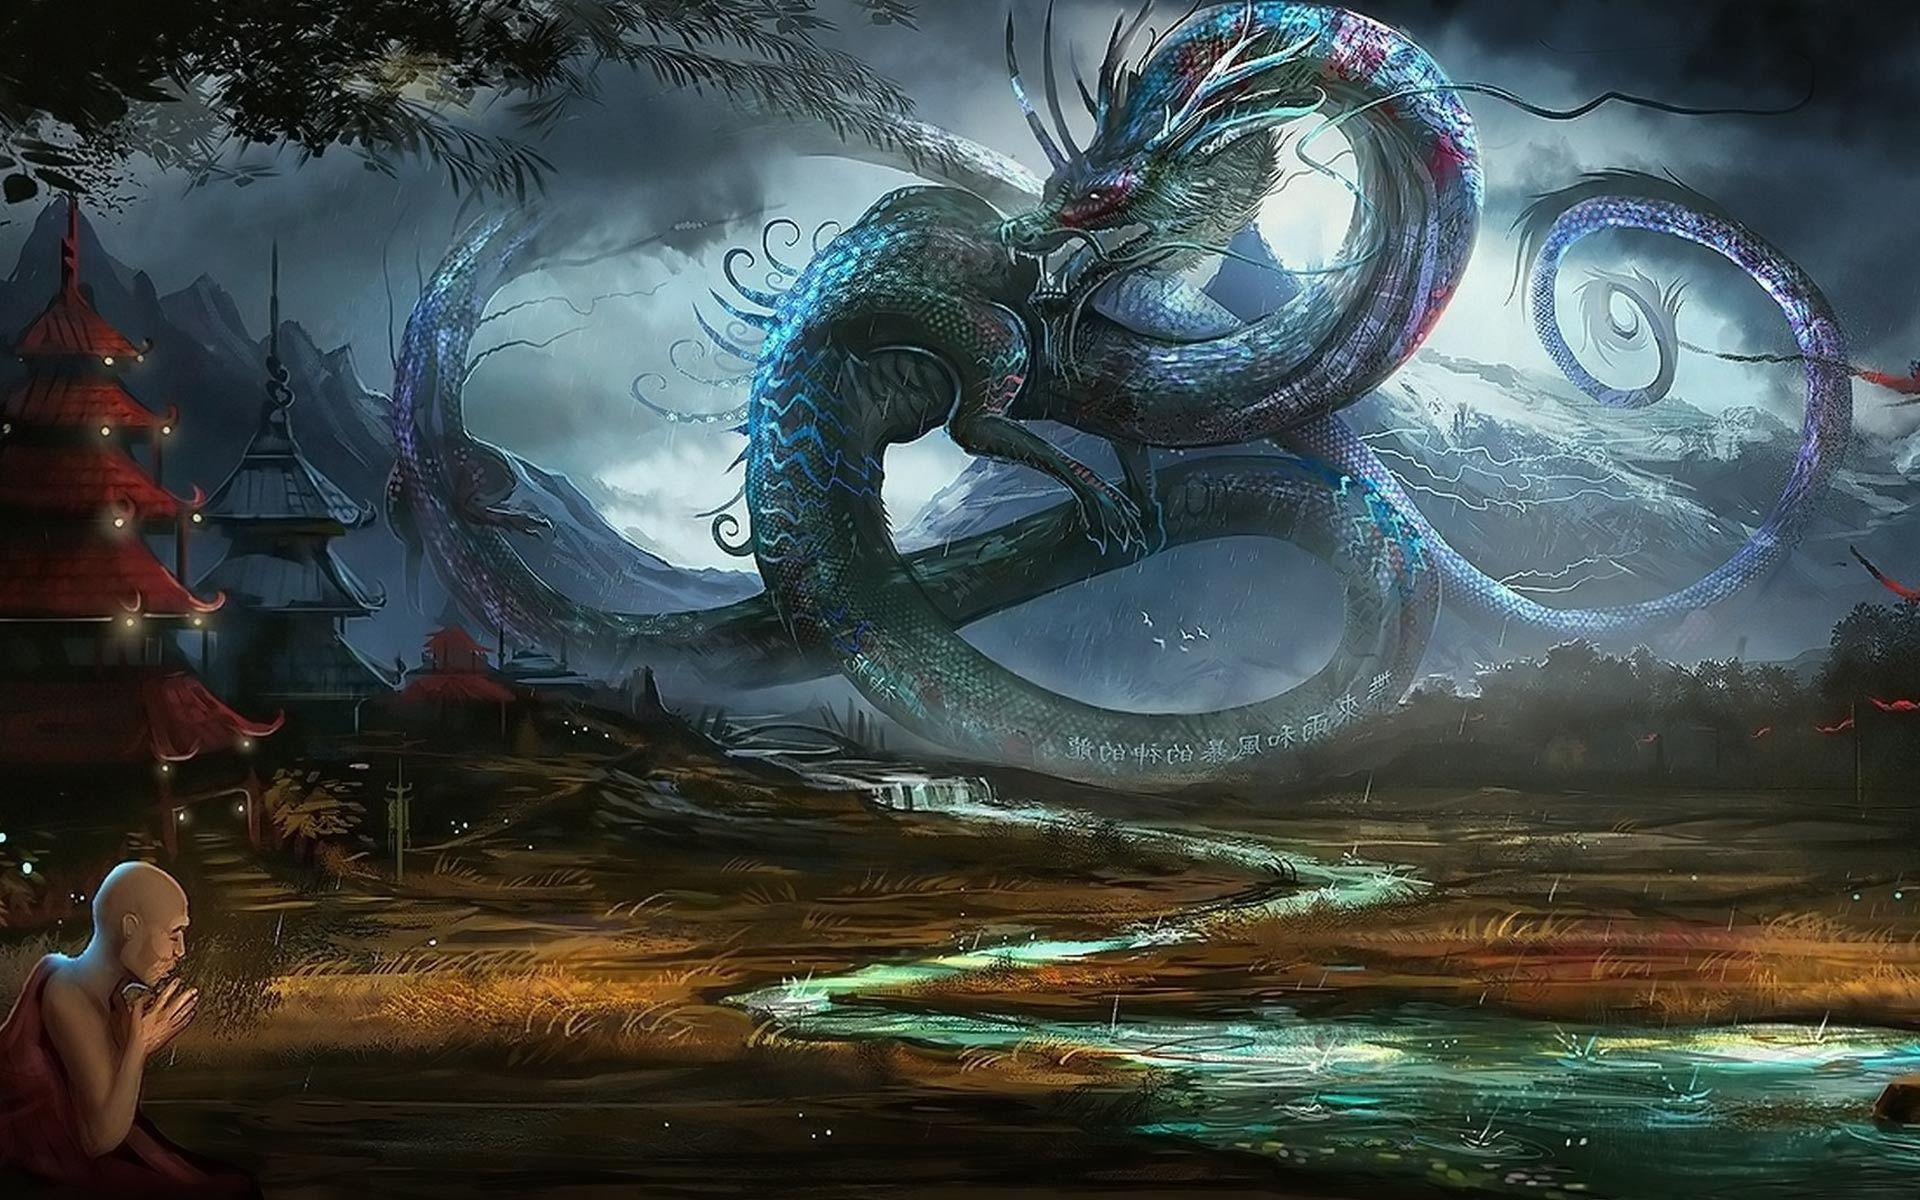 Dragon in ancient China 1920x1200 Fantasy Wallpaper | Cool